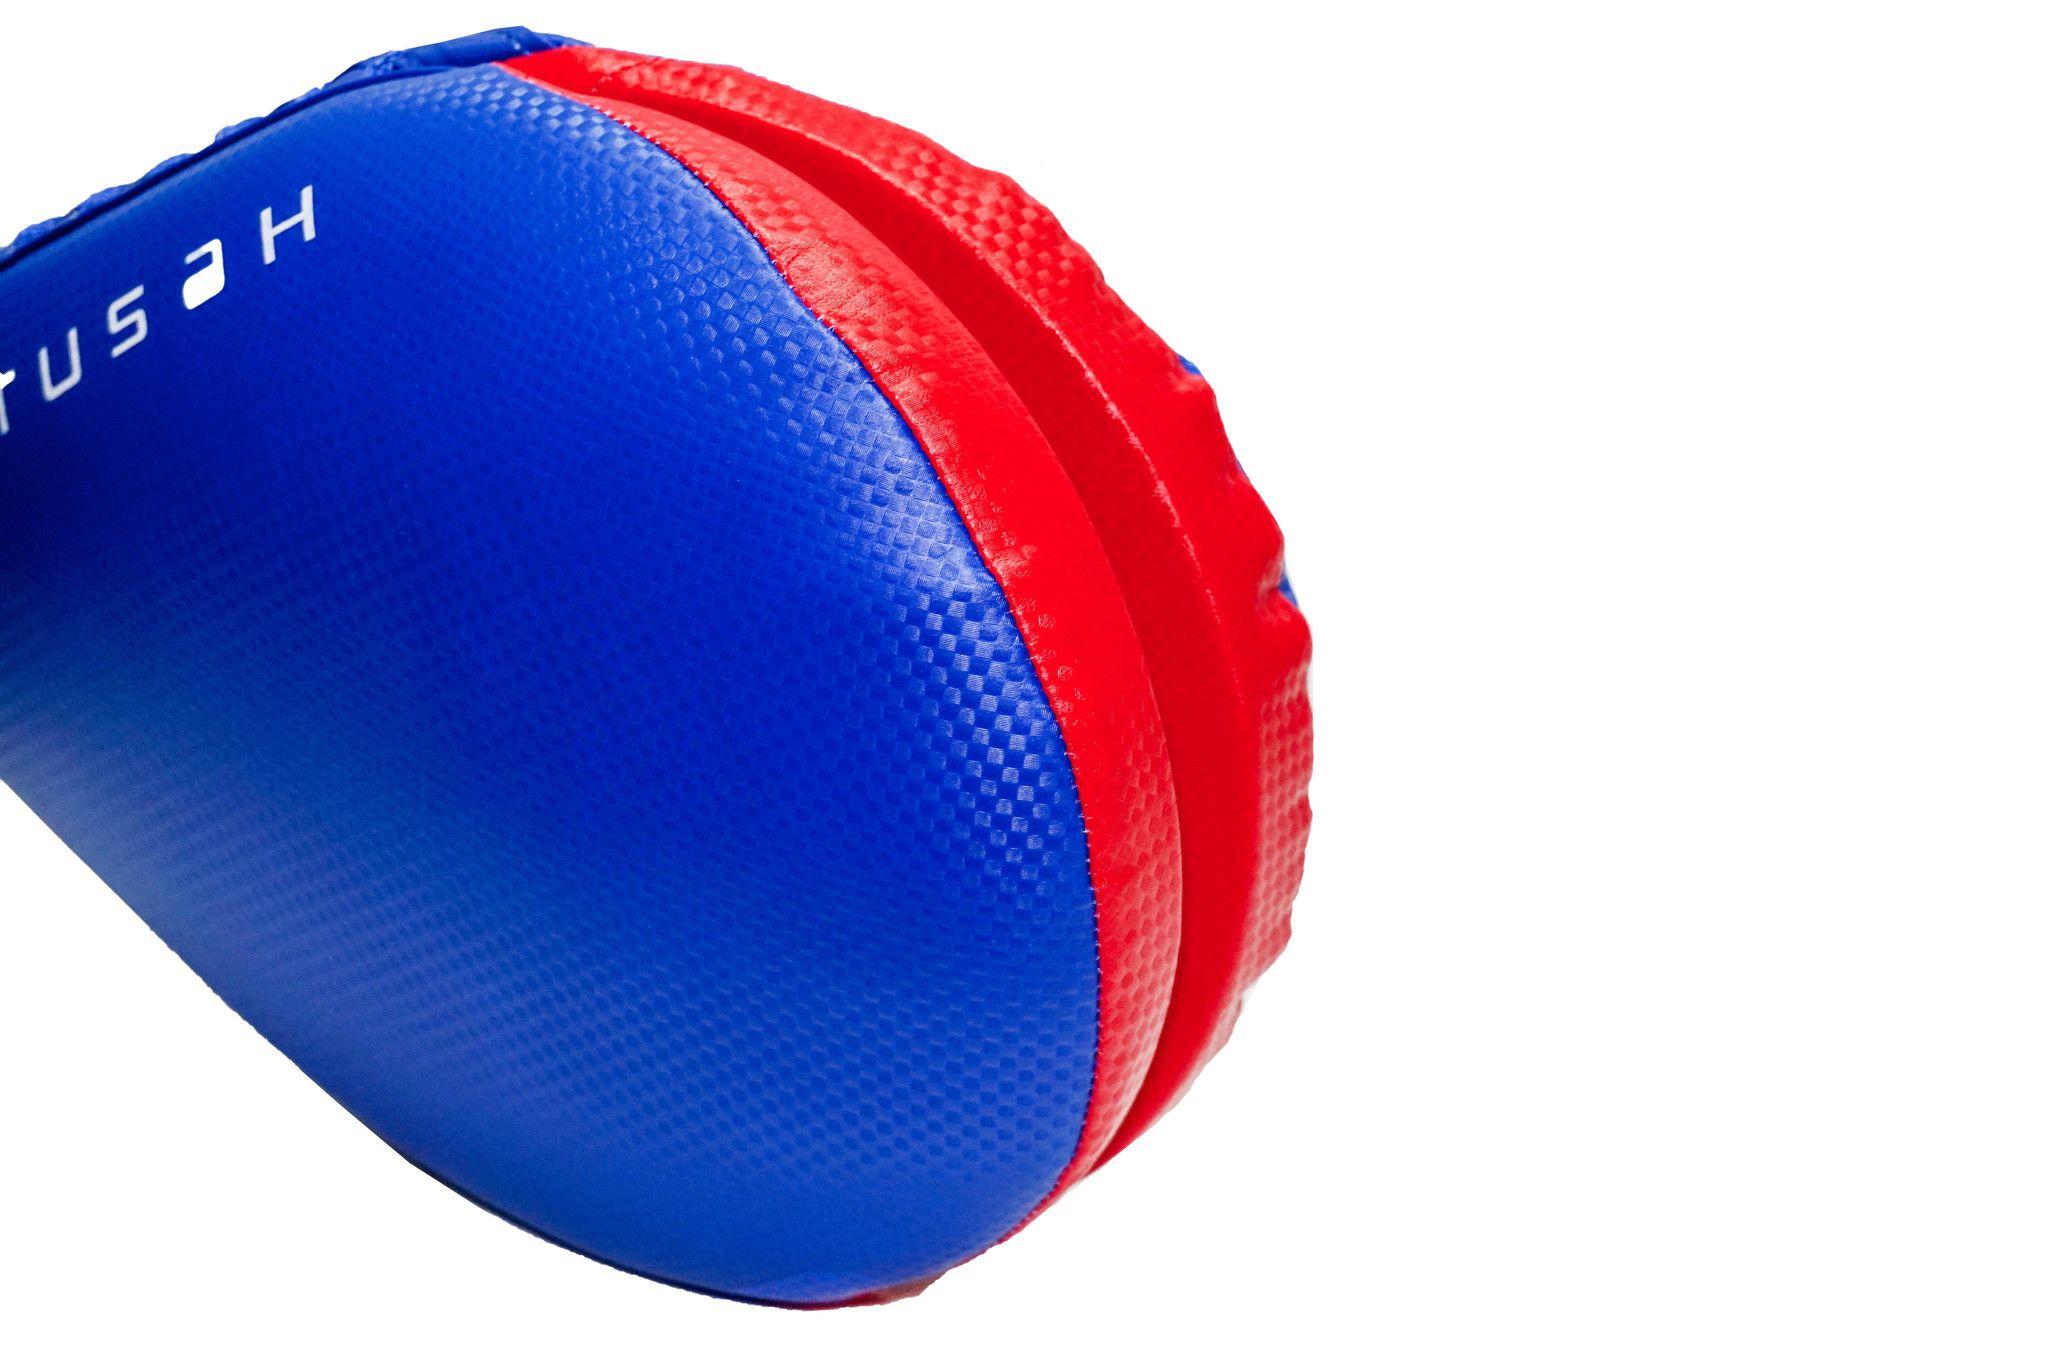 Tusah - Colpitore Doppio Blu paletta per Taekwondo, Karate Kicktarget